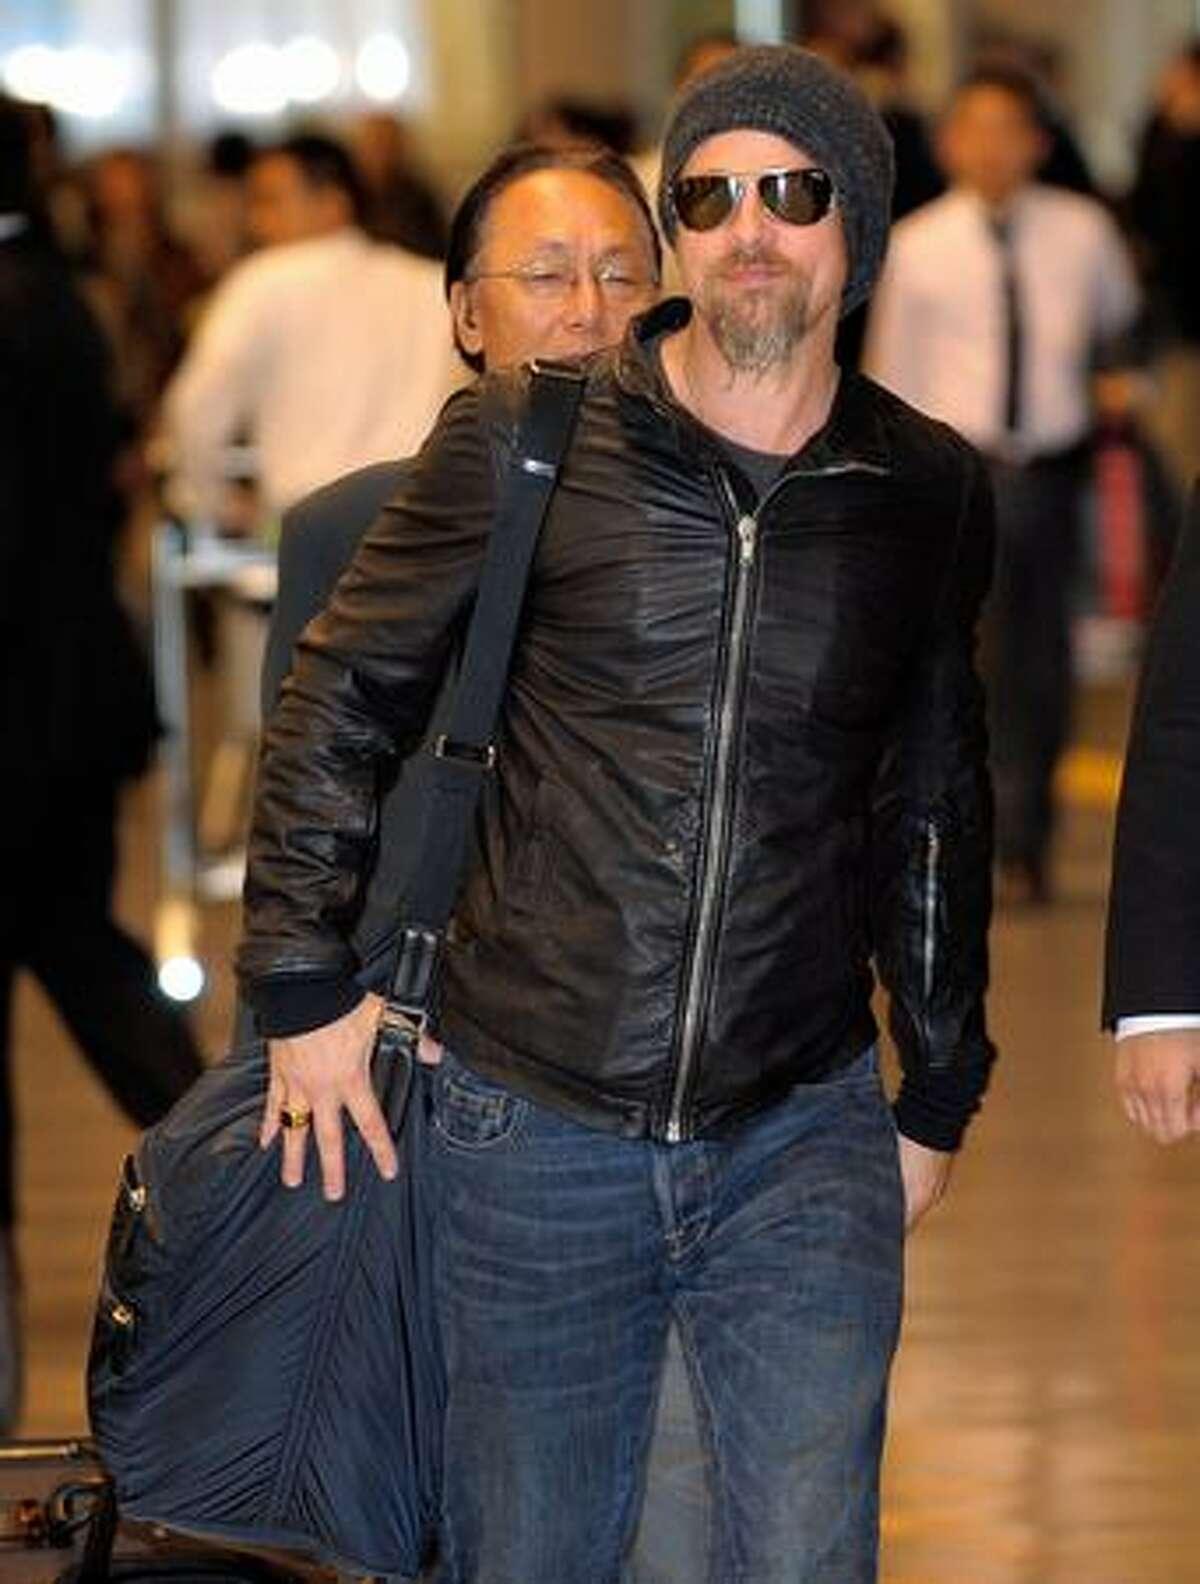 Brad Pitt arrives at Narita International airport Tuesday in the eastern surburbs of Tokyo. AFP PHOTO / TOSHIFUMI KITAMURA